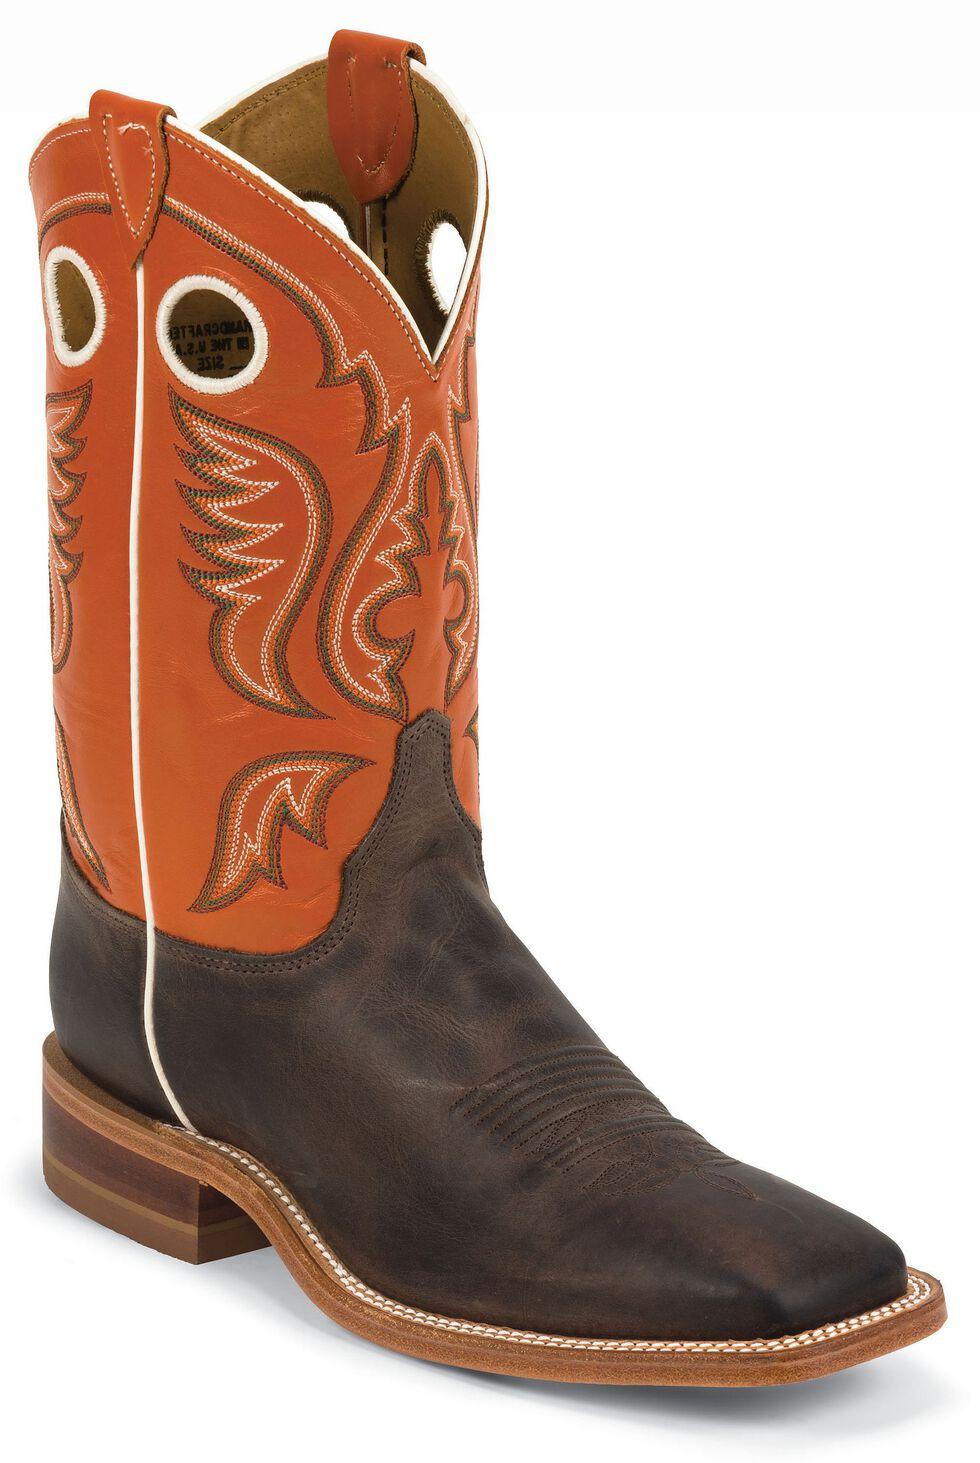 Justin Burnished Orange Cowboy Boots - Square Toe, Chocolate, hi-res